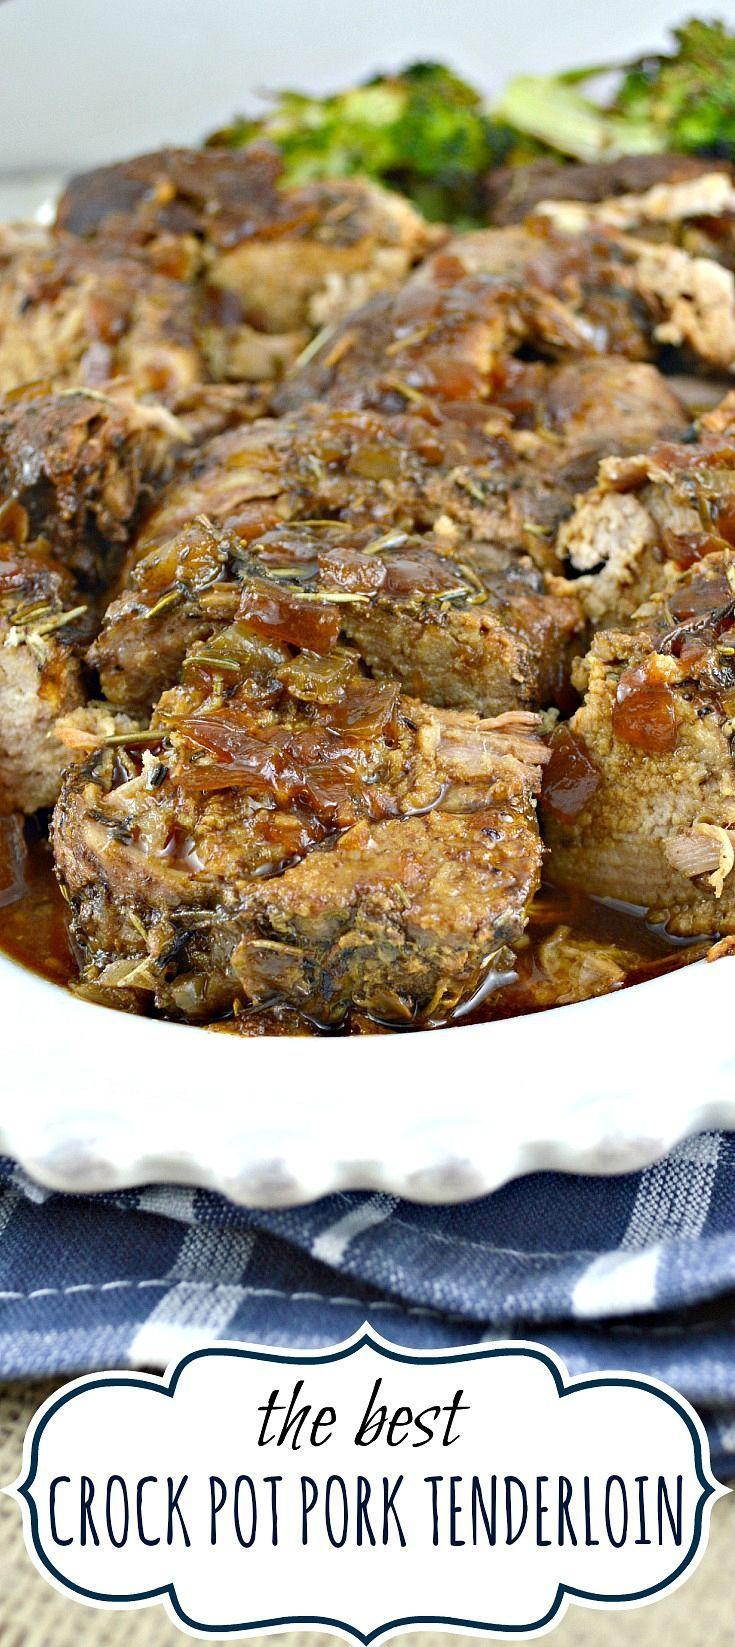 Crock pot pork tenderloin. This recipe makes an incredibly tender, moist,flavorful pork tenderloin with a fabulous pan sauce/gravy. All from scratch-no canned soup!  Order Zaycon Fresh here: https://www.zayconfresh.com/?utm_source=pinterest.com&utm_medium=zaycon&utm_term=8242015&utm_content=post&utm_campaign=139